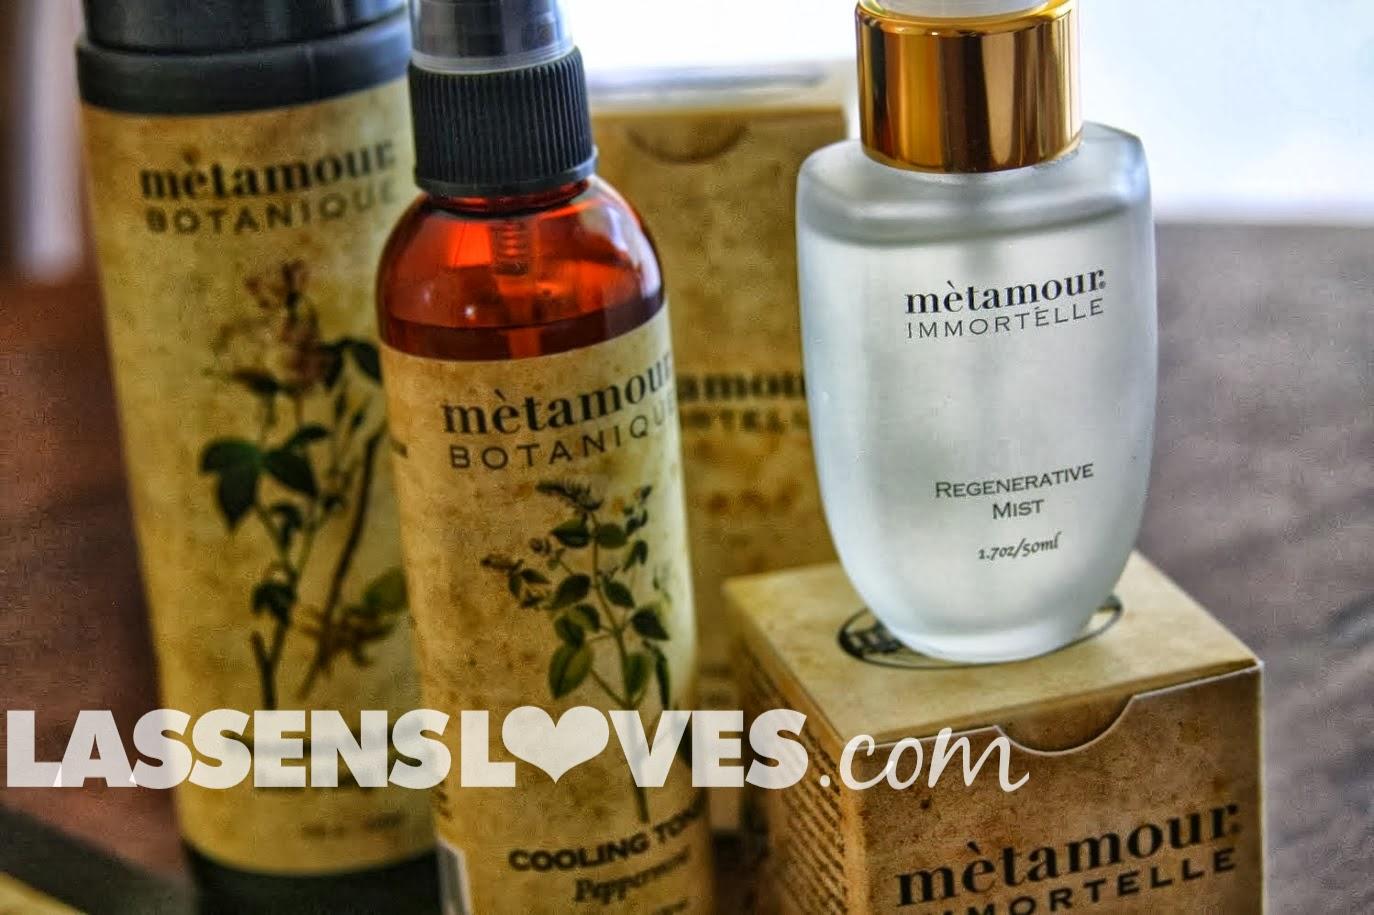 lassensloves.com, Lassen's, Metamour+Immortelle, Metamour+Bontanique, Cooling+Toner, Regenerative+Mist